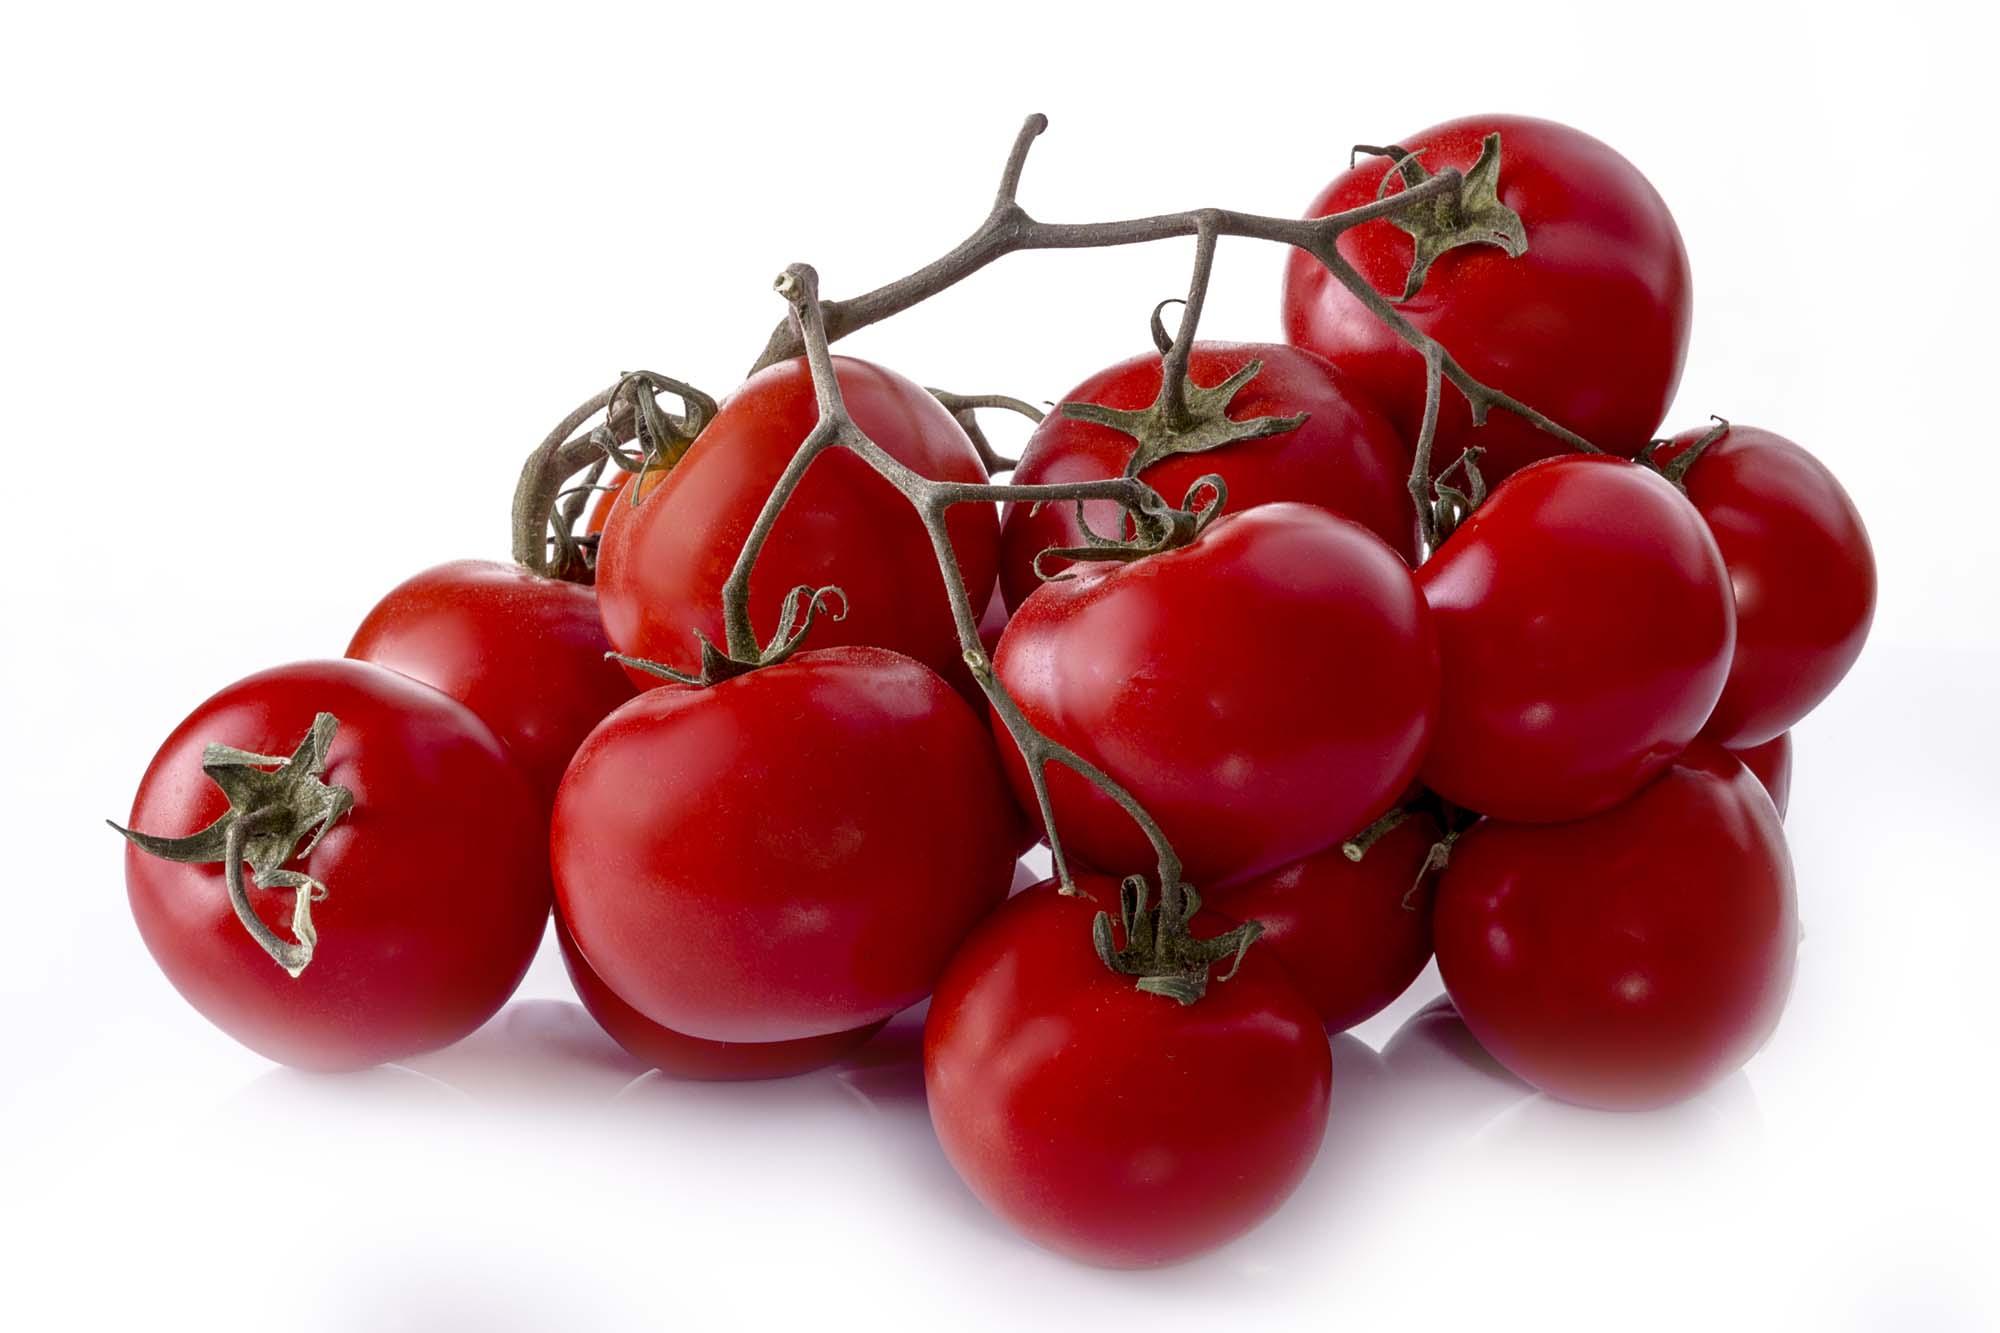 variedades de tomates con sabor: en rama